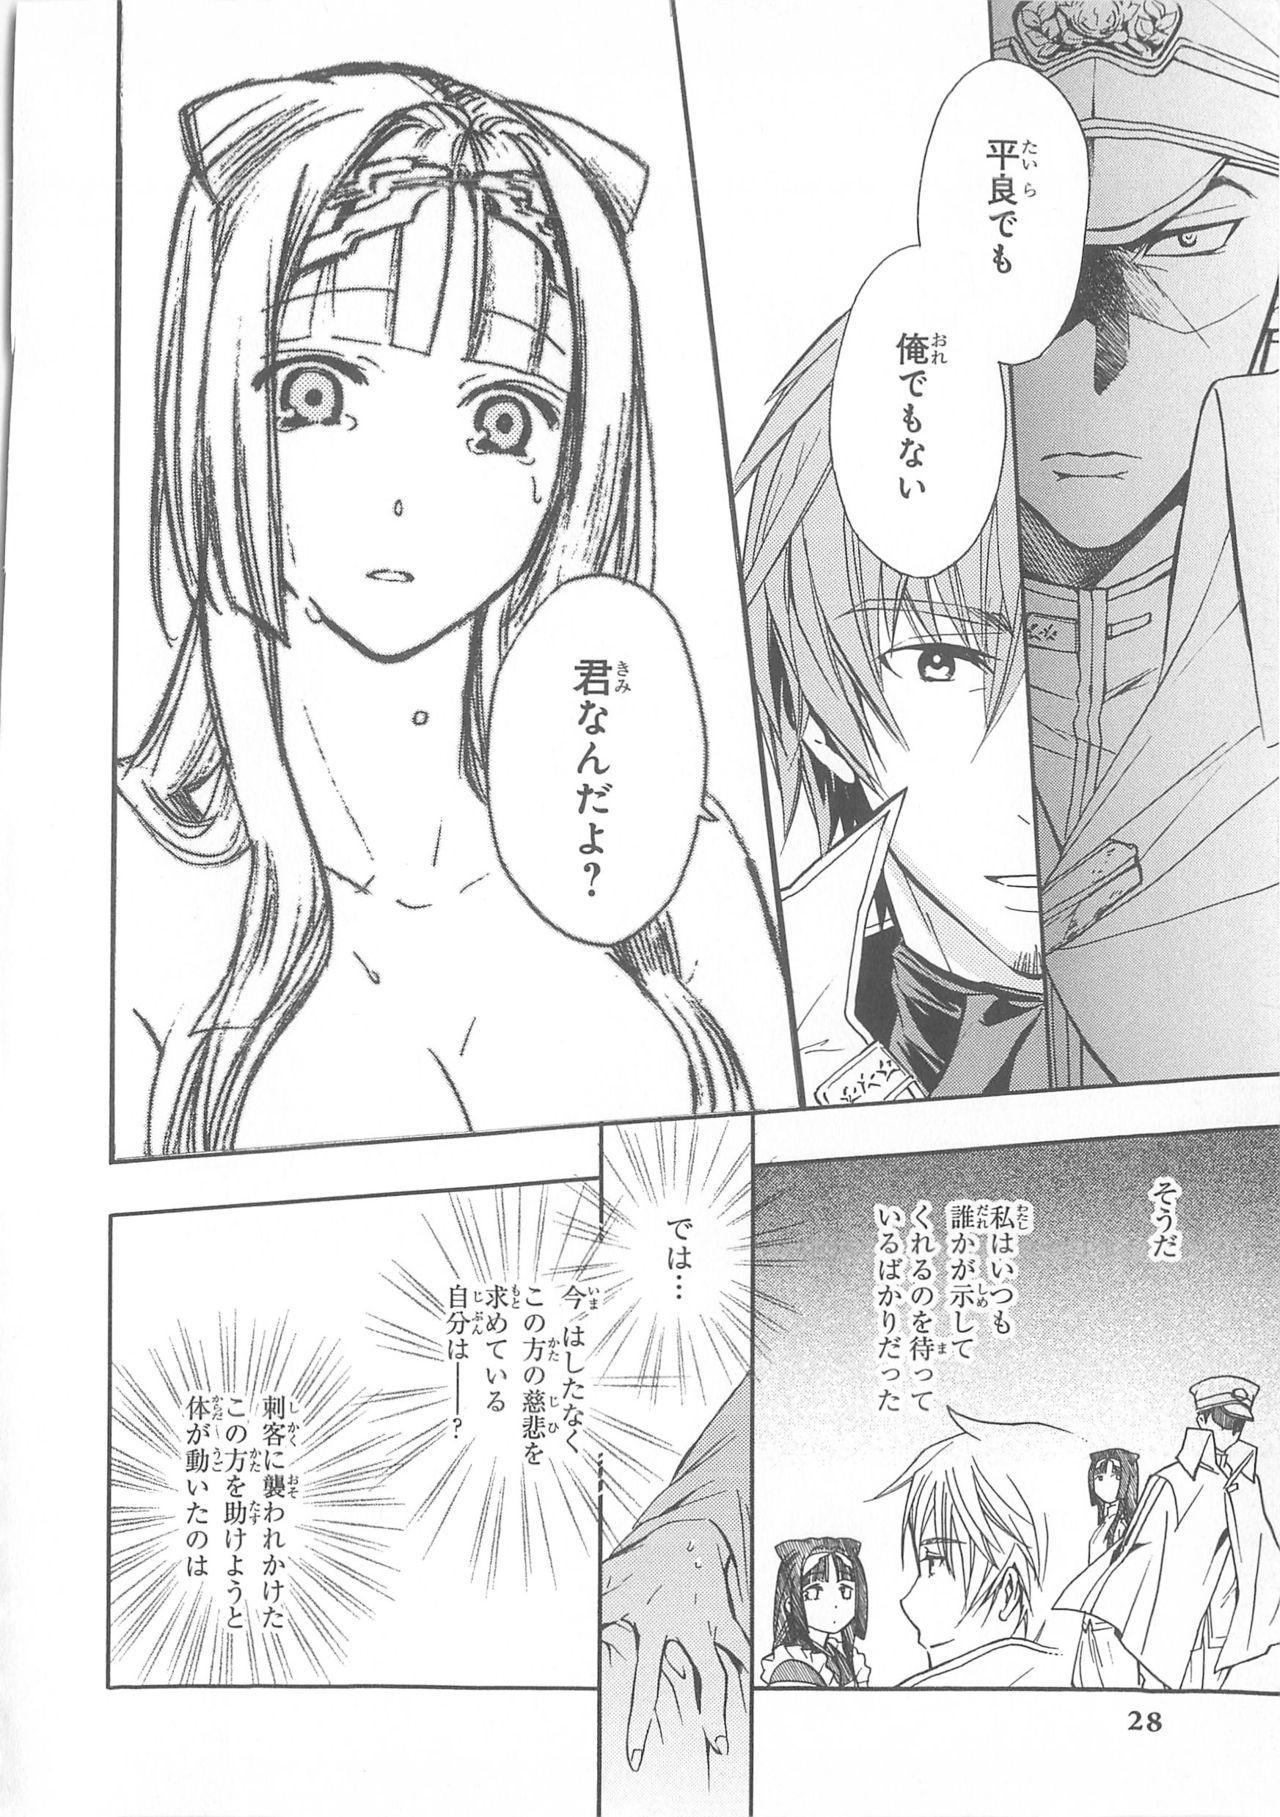 Daiteikoku comic Anthology vol.2 28